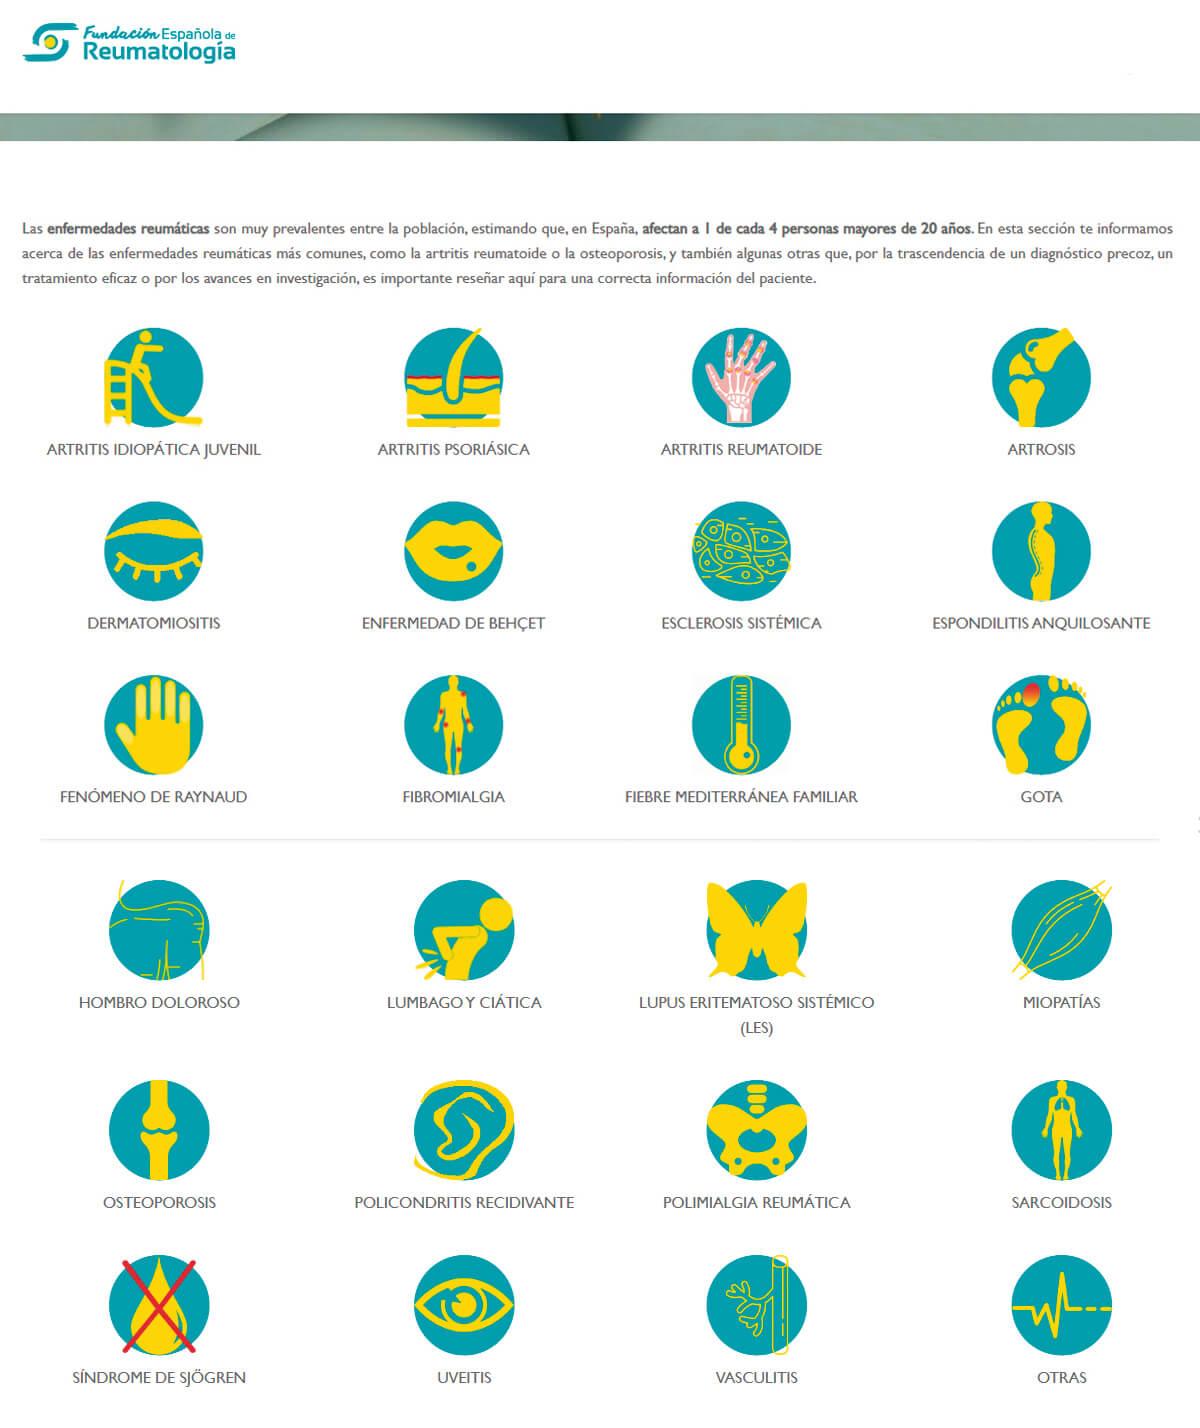 Guías para pacientes con enfermedades reumáticas